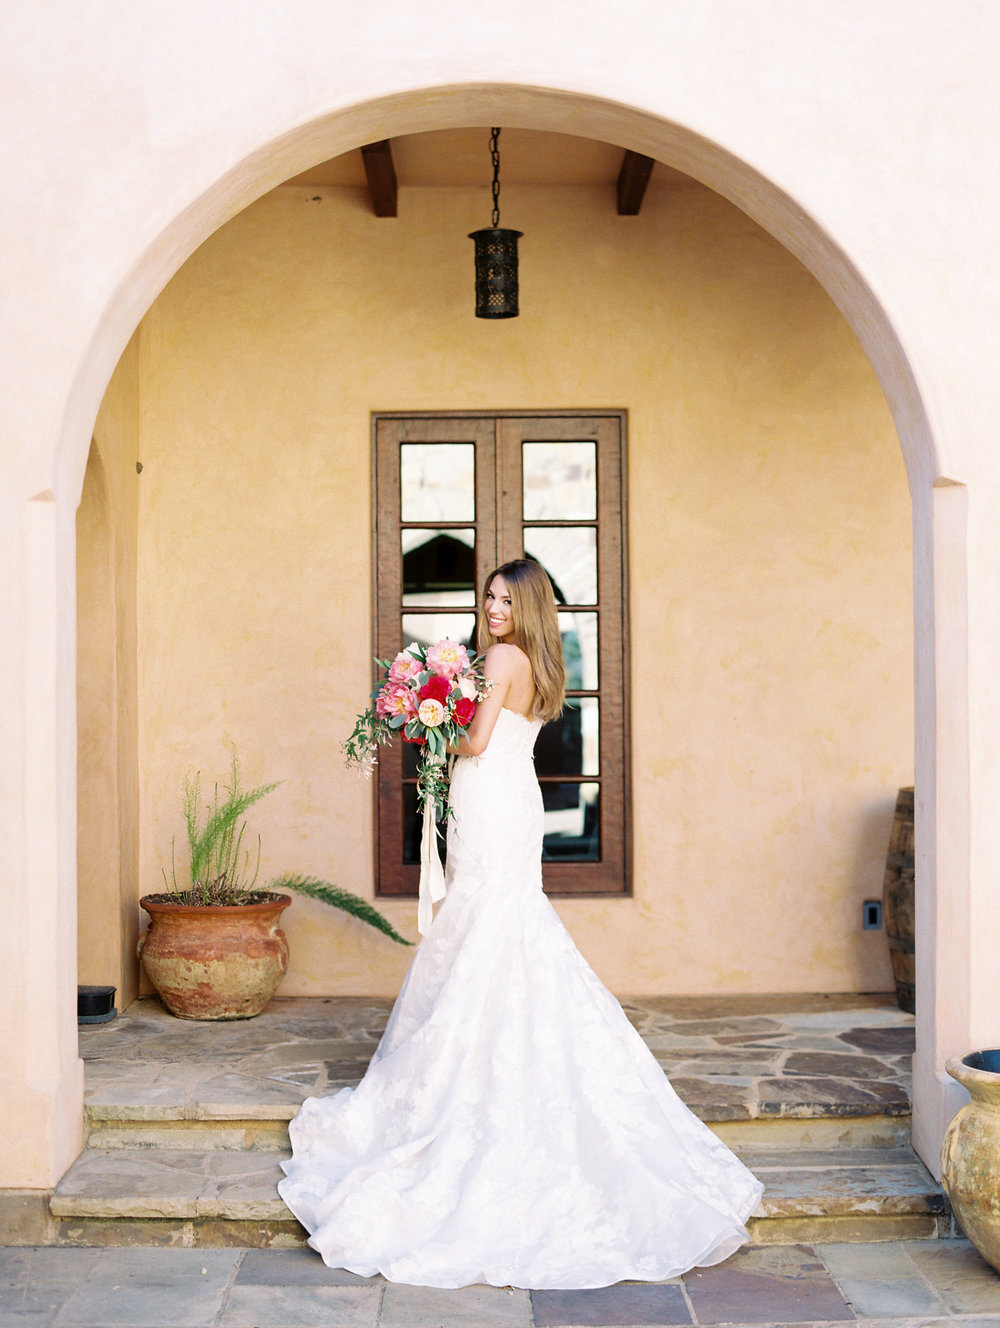 Escondido-Golf_Lake-Club-Hill-Country-Houston-Wedding-Photographer-Best-Top-Luxury-Destination-Engagements-Portrait-Austin-Photography-23.jpg